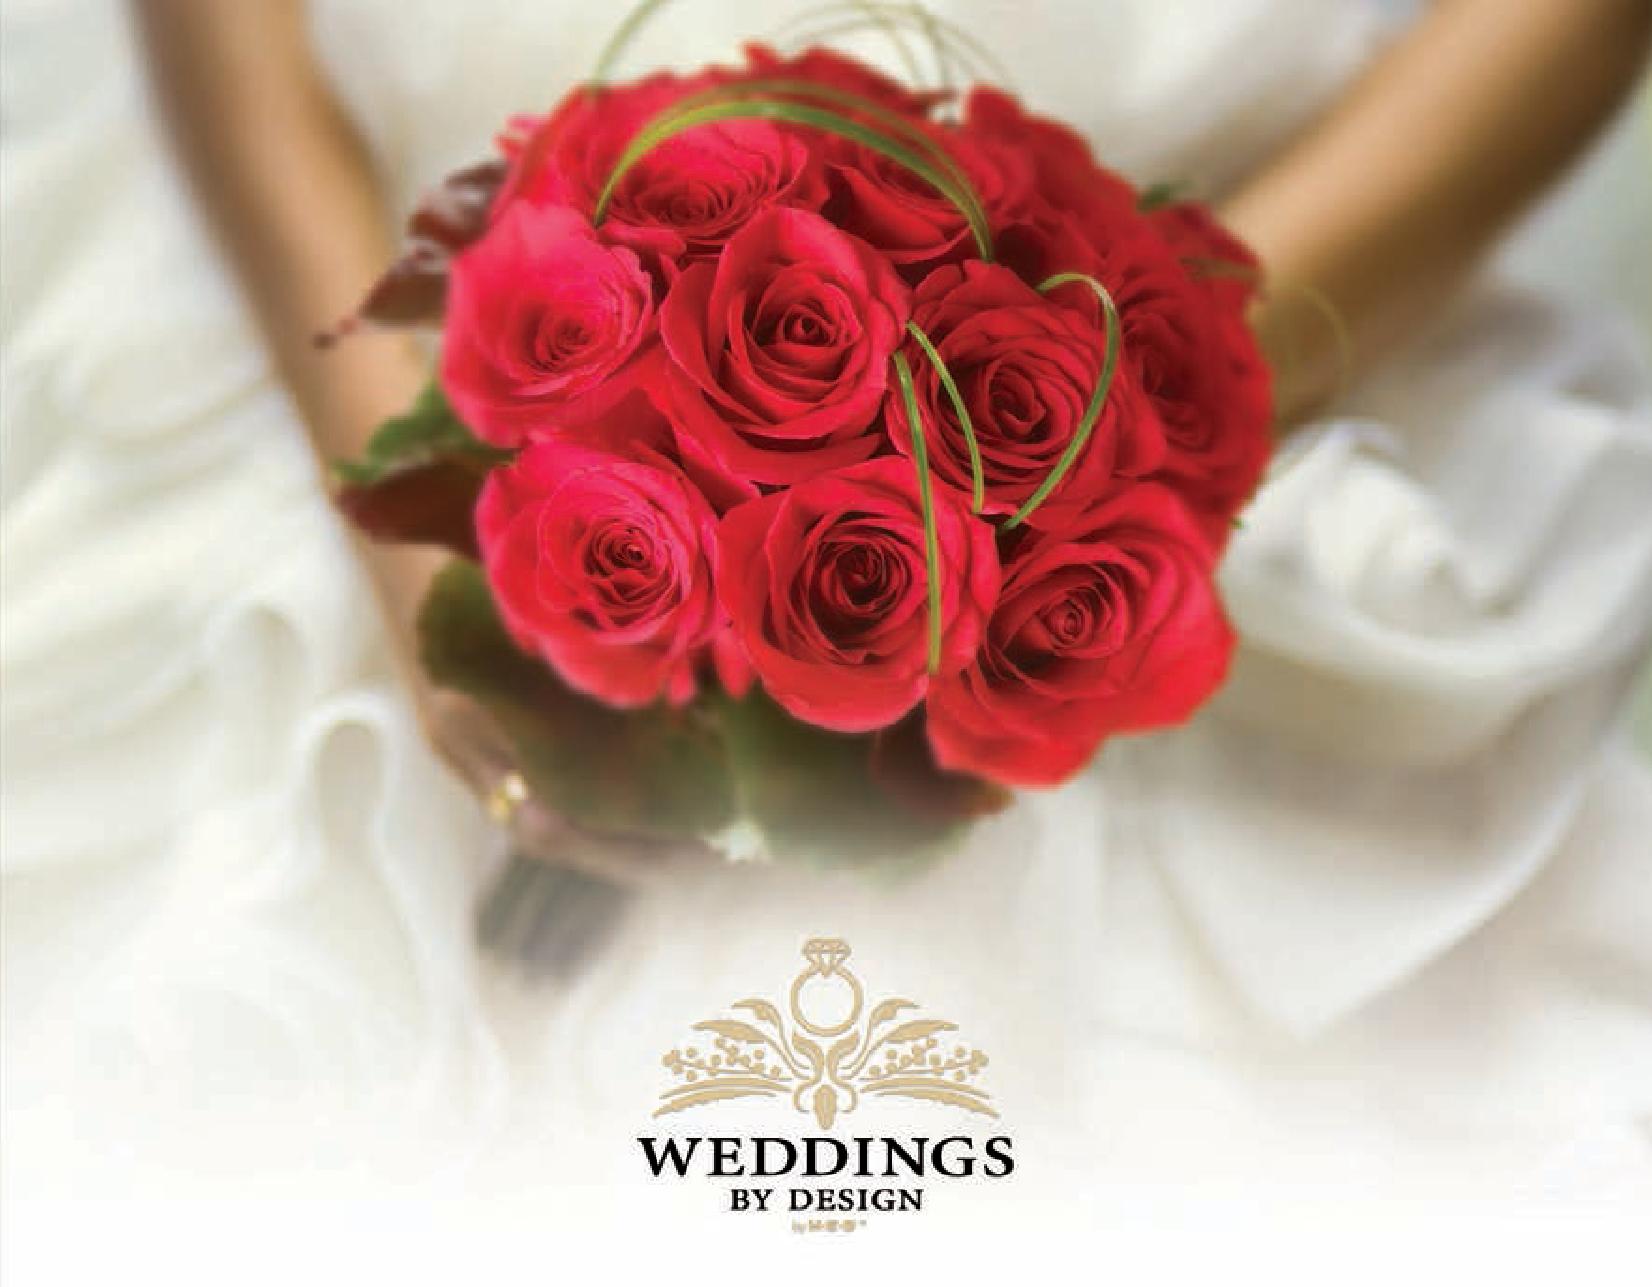 Weddings by Design by H E B